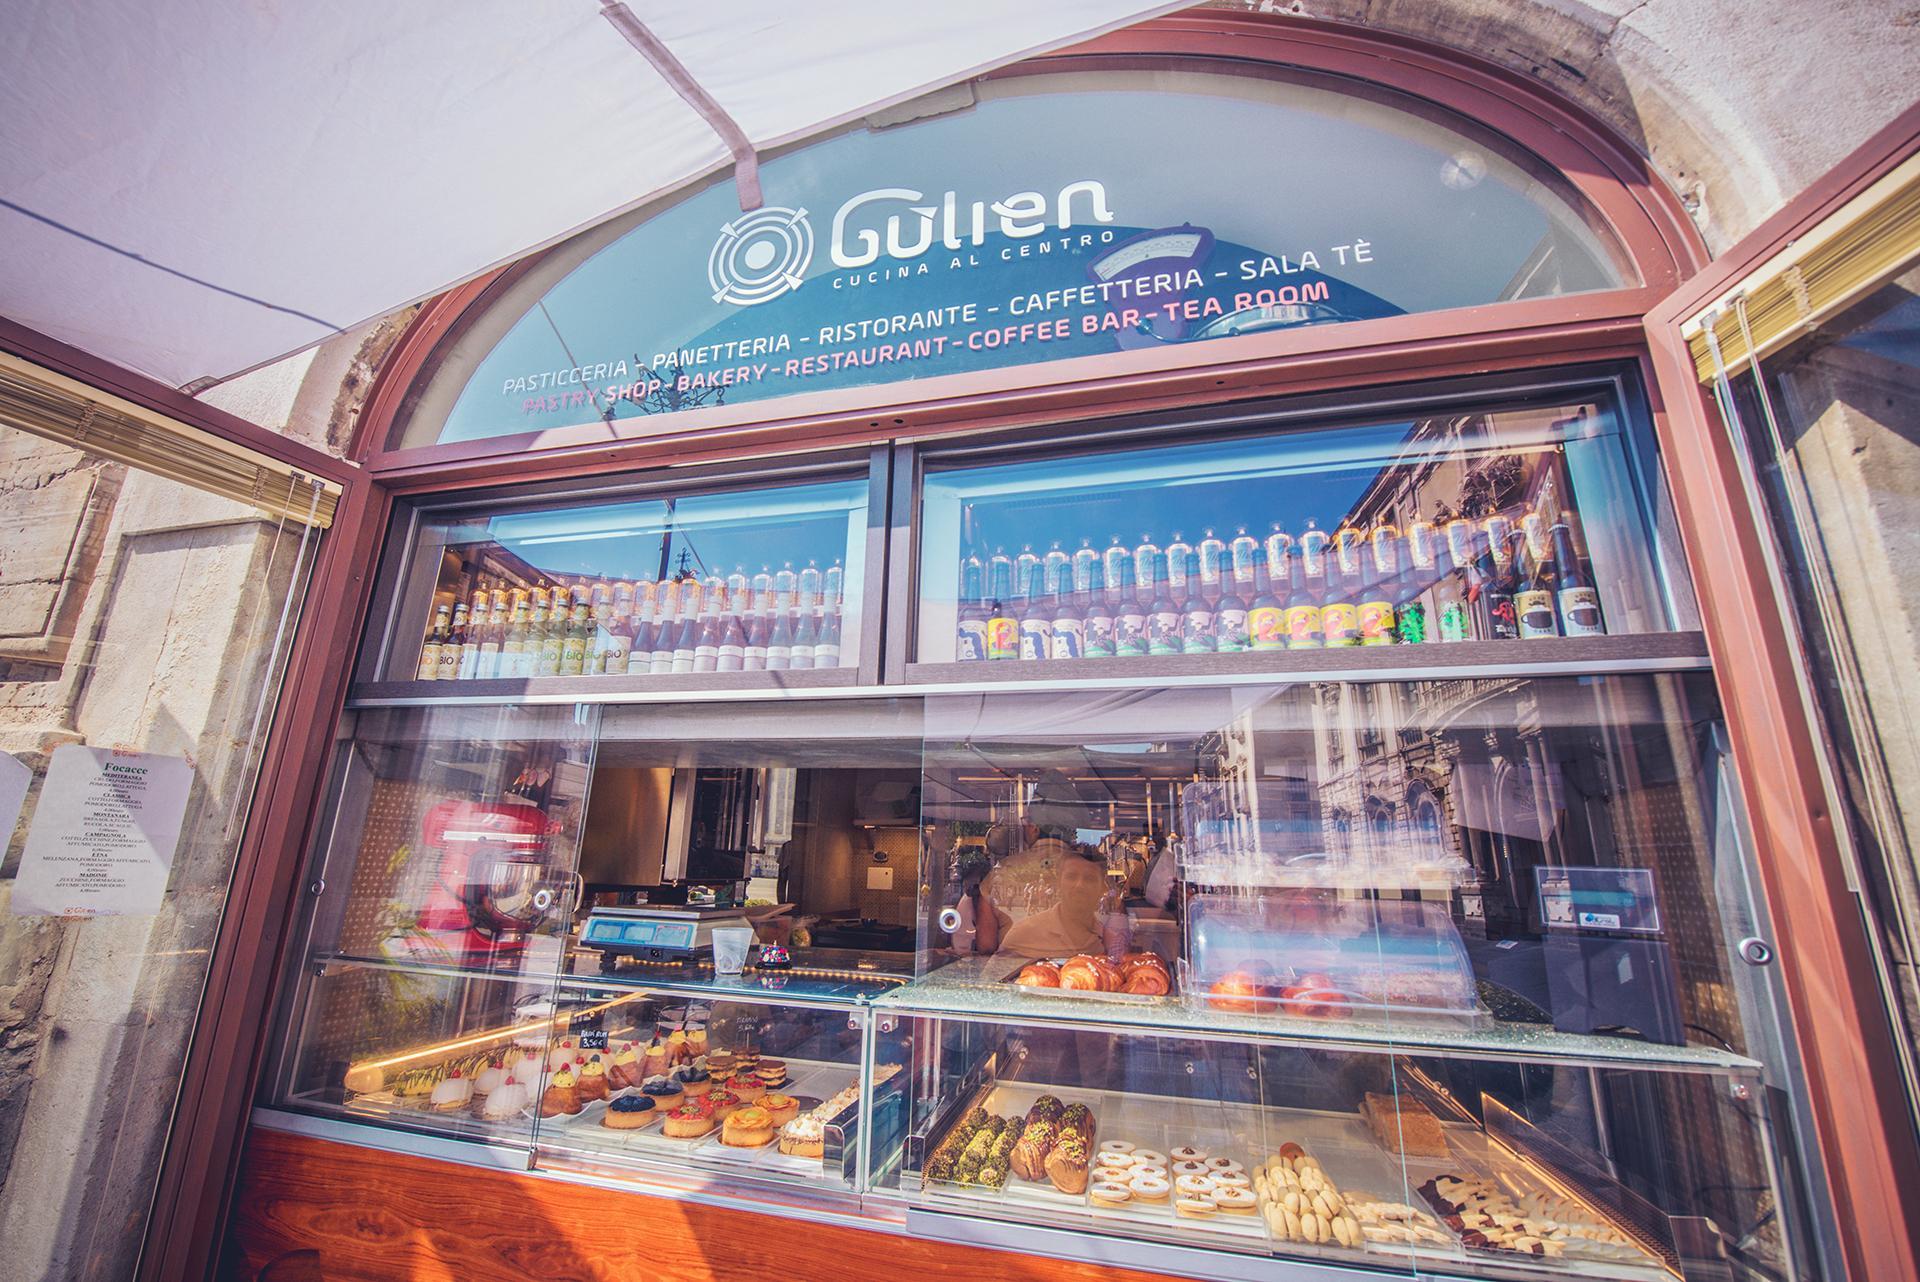 Gulien - Cucina al Centro7